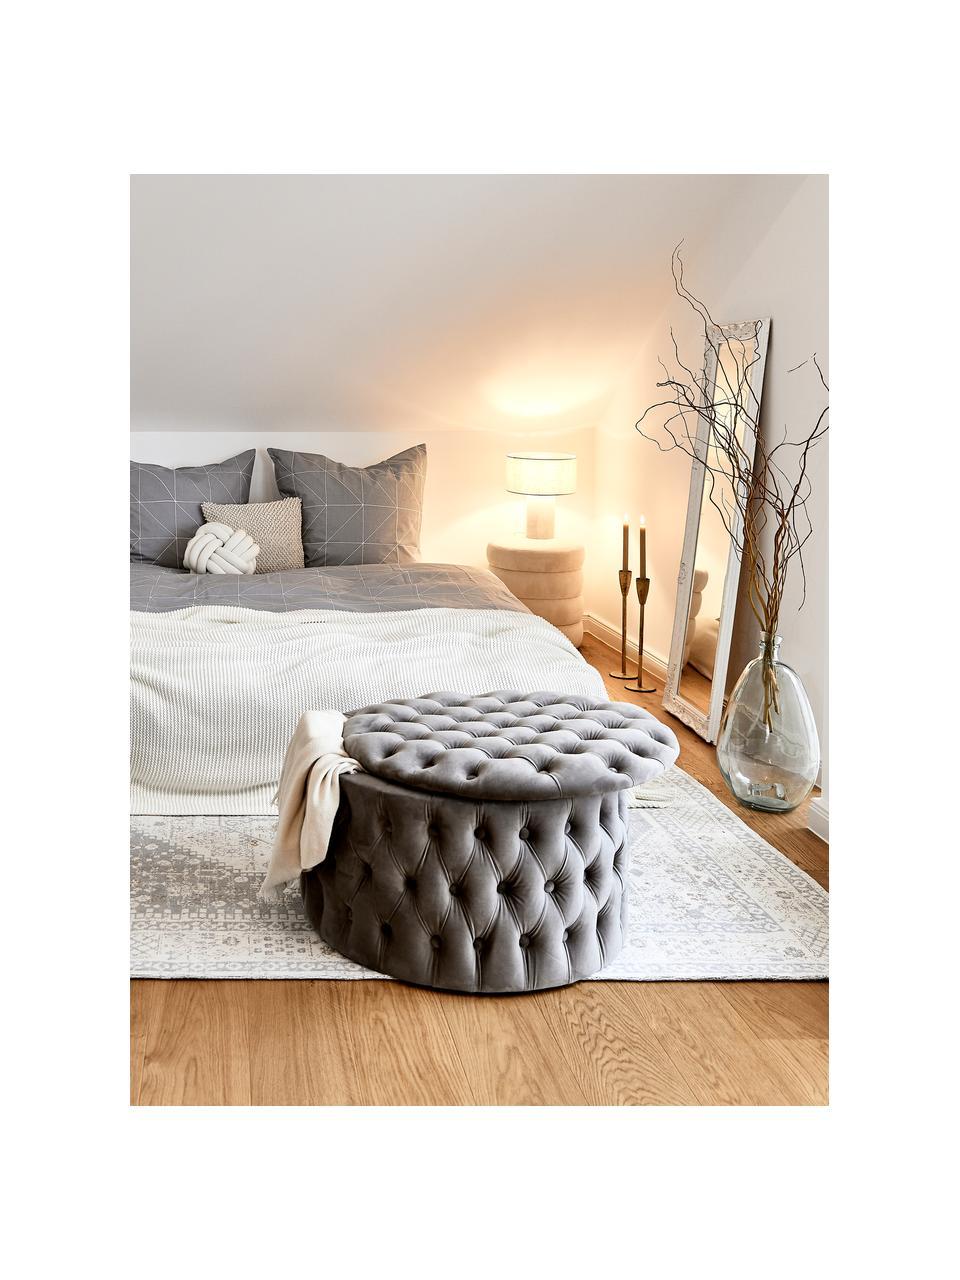 Lampada da tavolo in tessuto Ron, Paralume: tessuto, Base della lampada: tessuto, Paralume: grigio base della lampada: grigio cavo: nero, Ø 30 x Alt. 35 cm